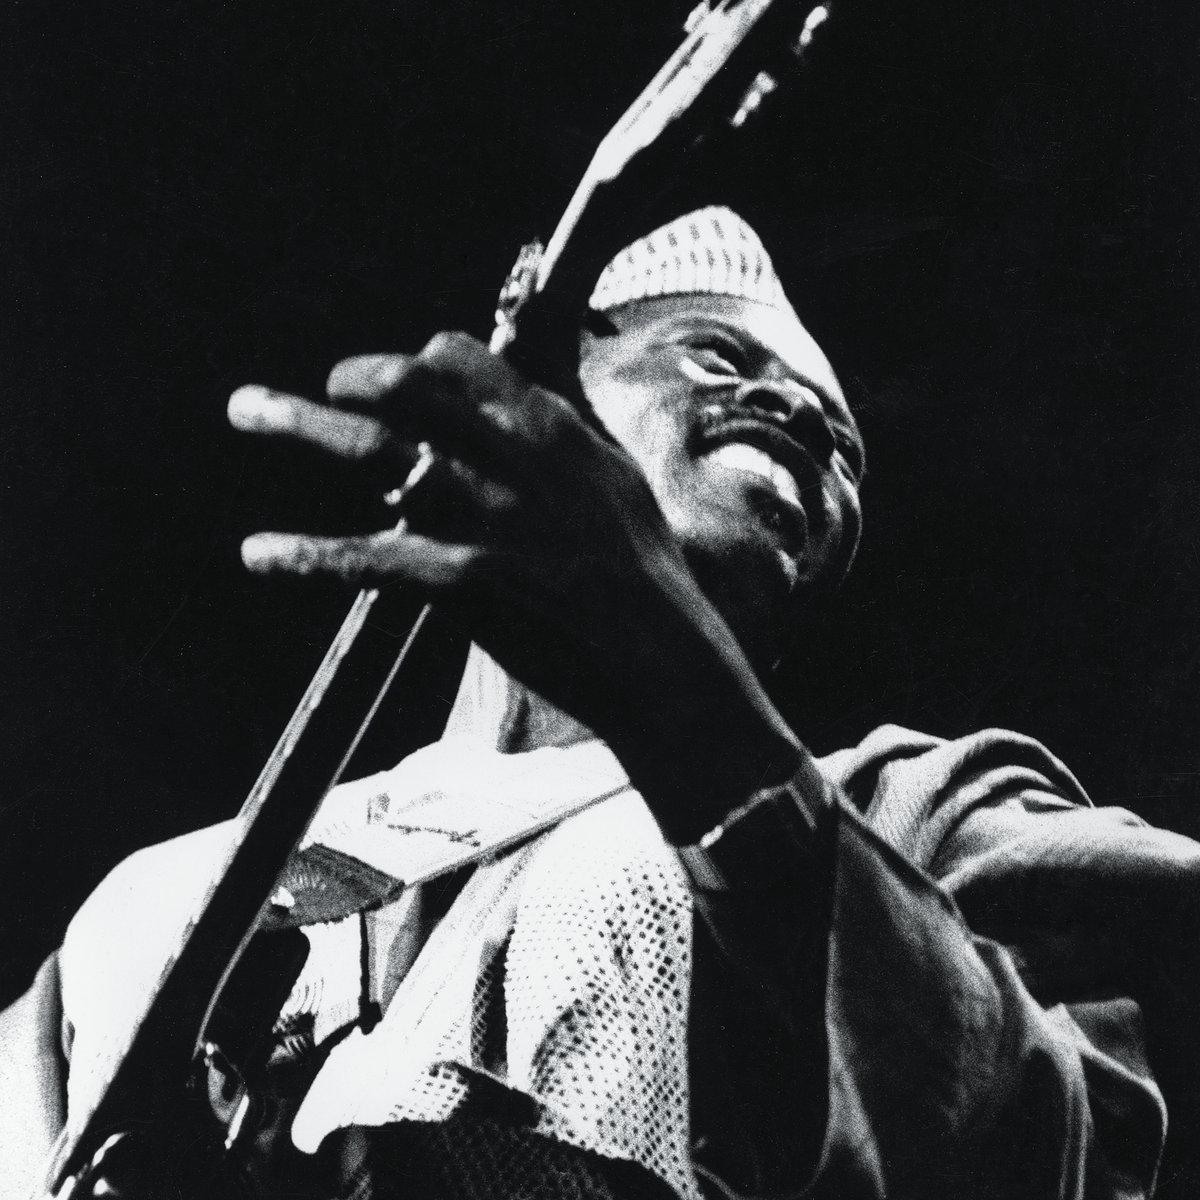 Ali Farka Touré - The Source (CD) - World Circuit Records